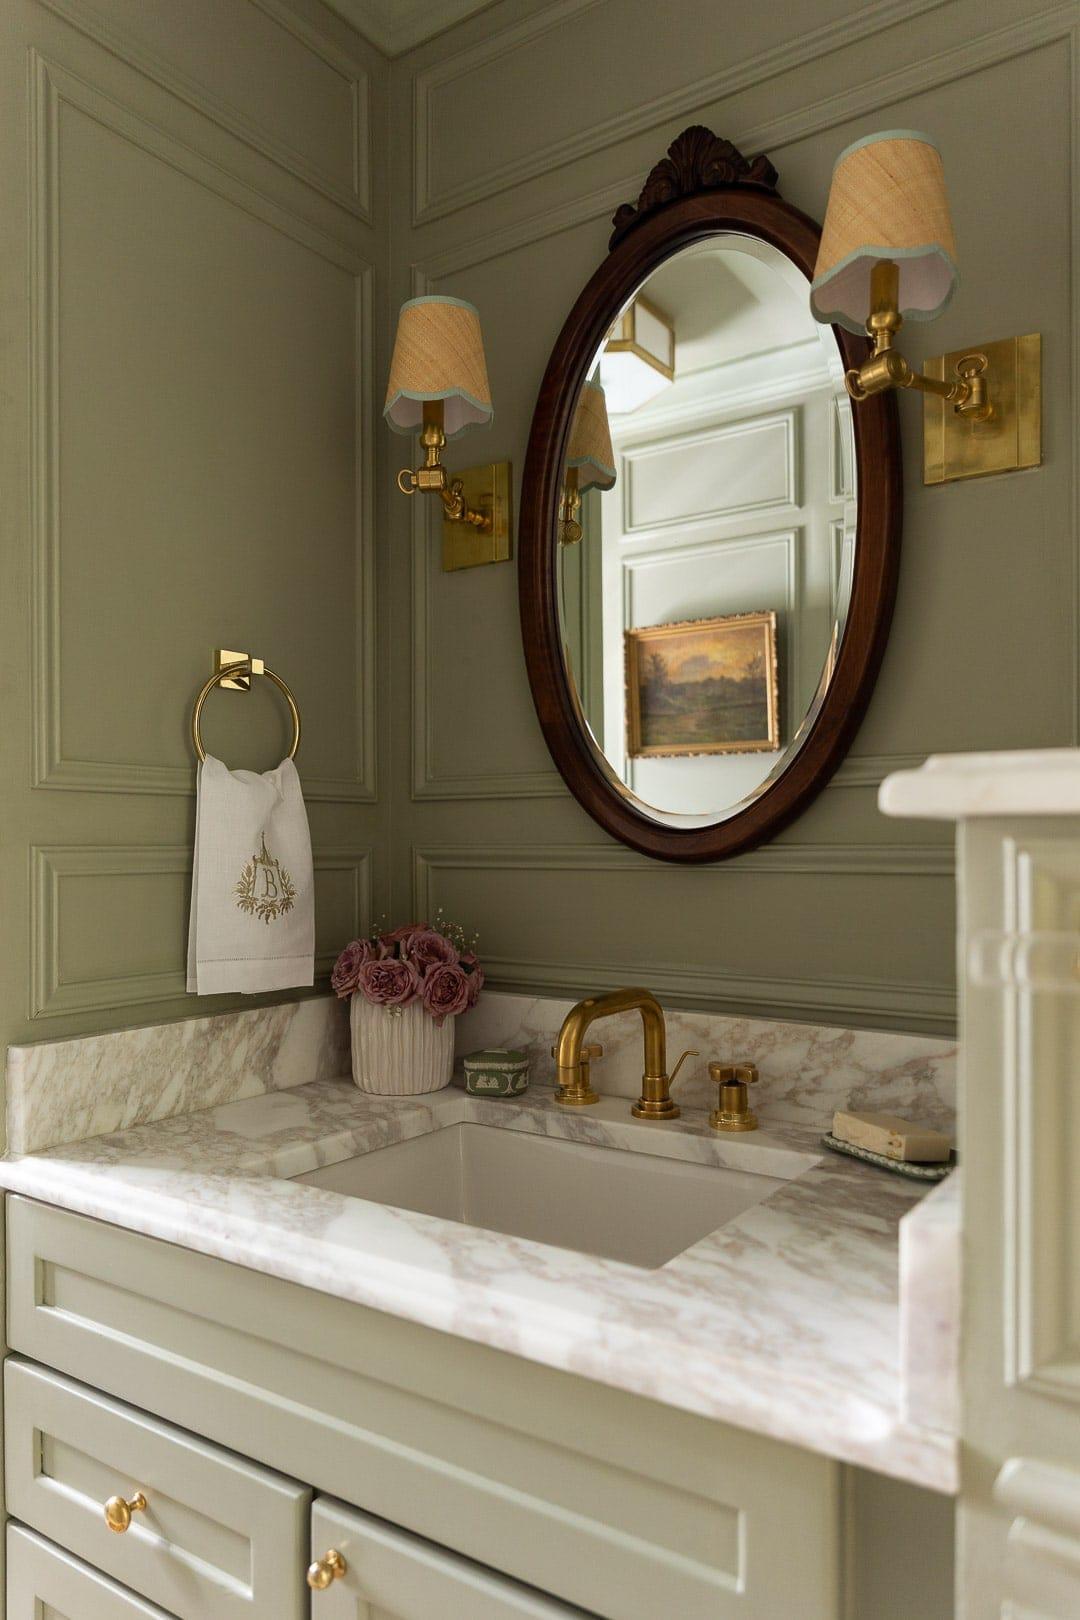 BATHROOM-DESIGN-LIGHTING-SCONCES-MARBLE-COUNTER